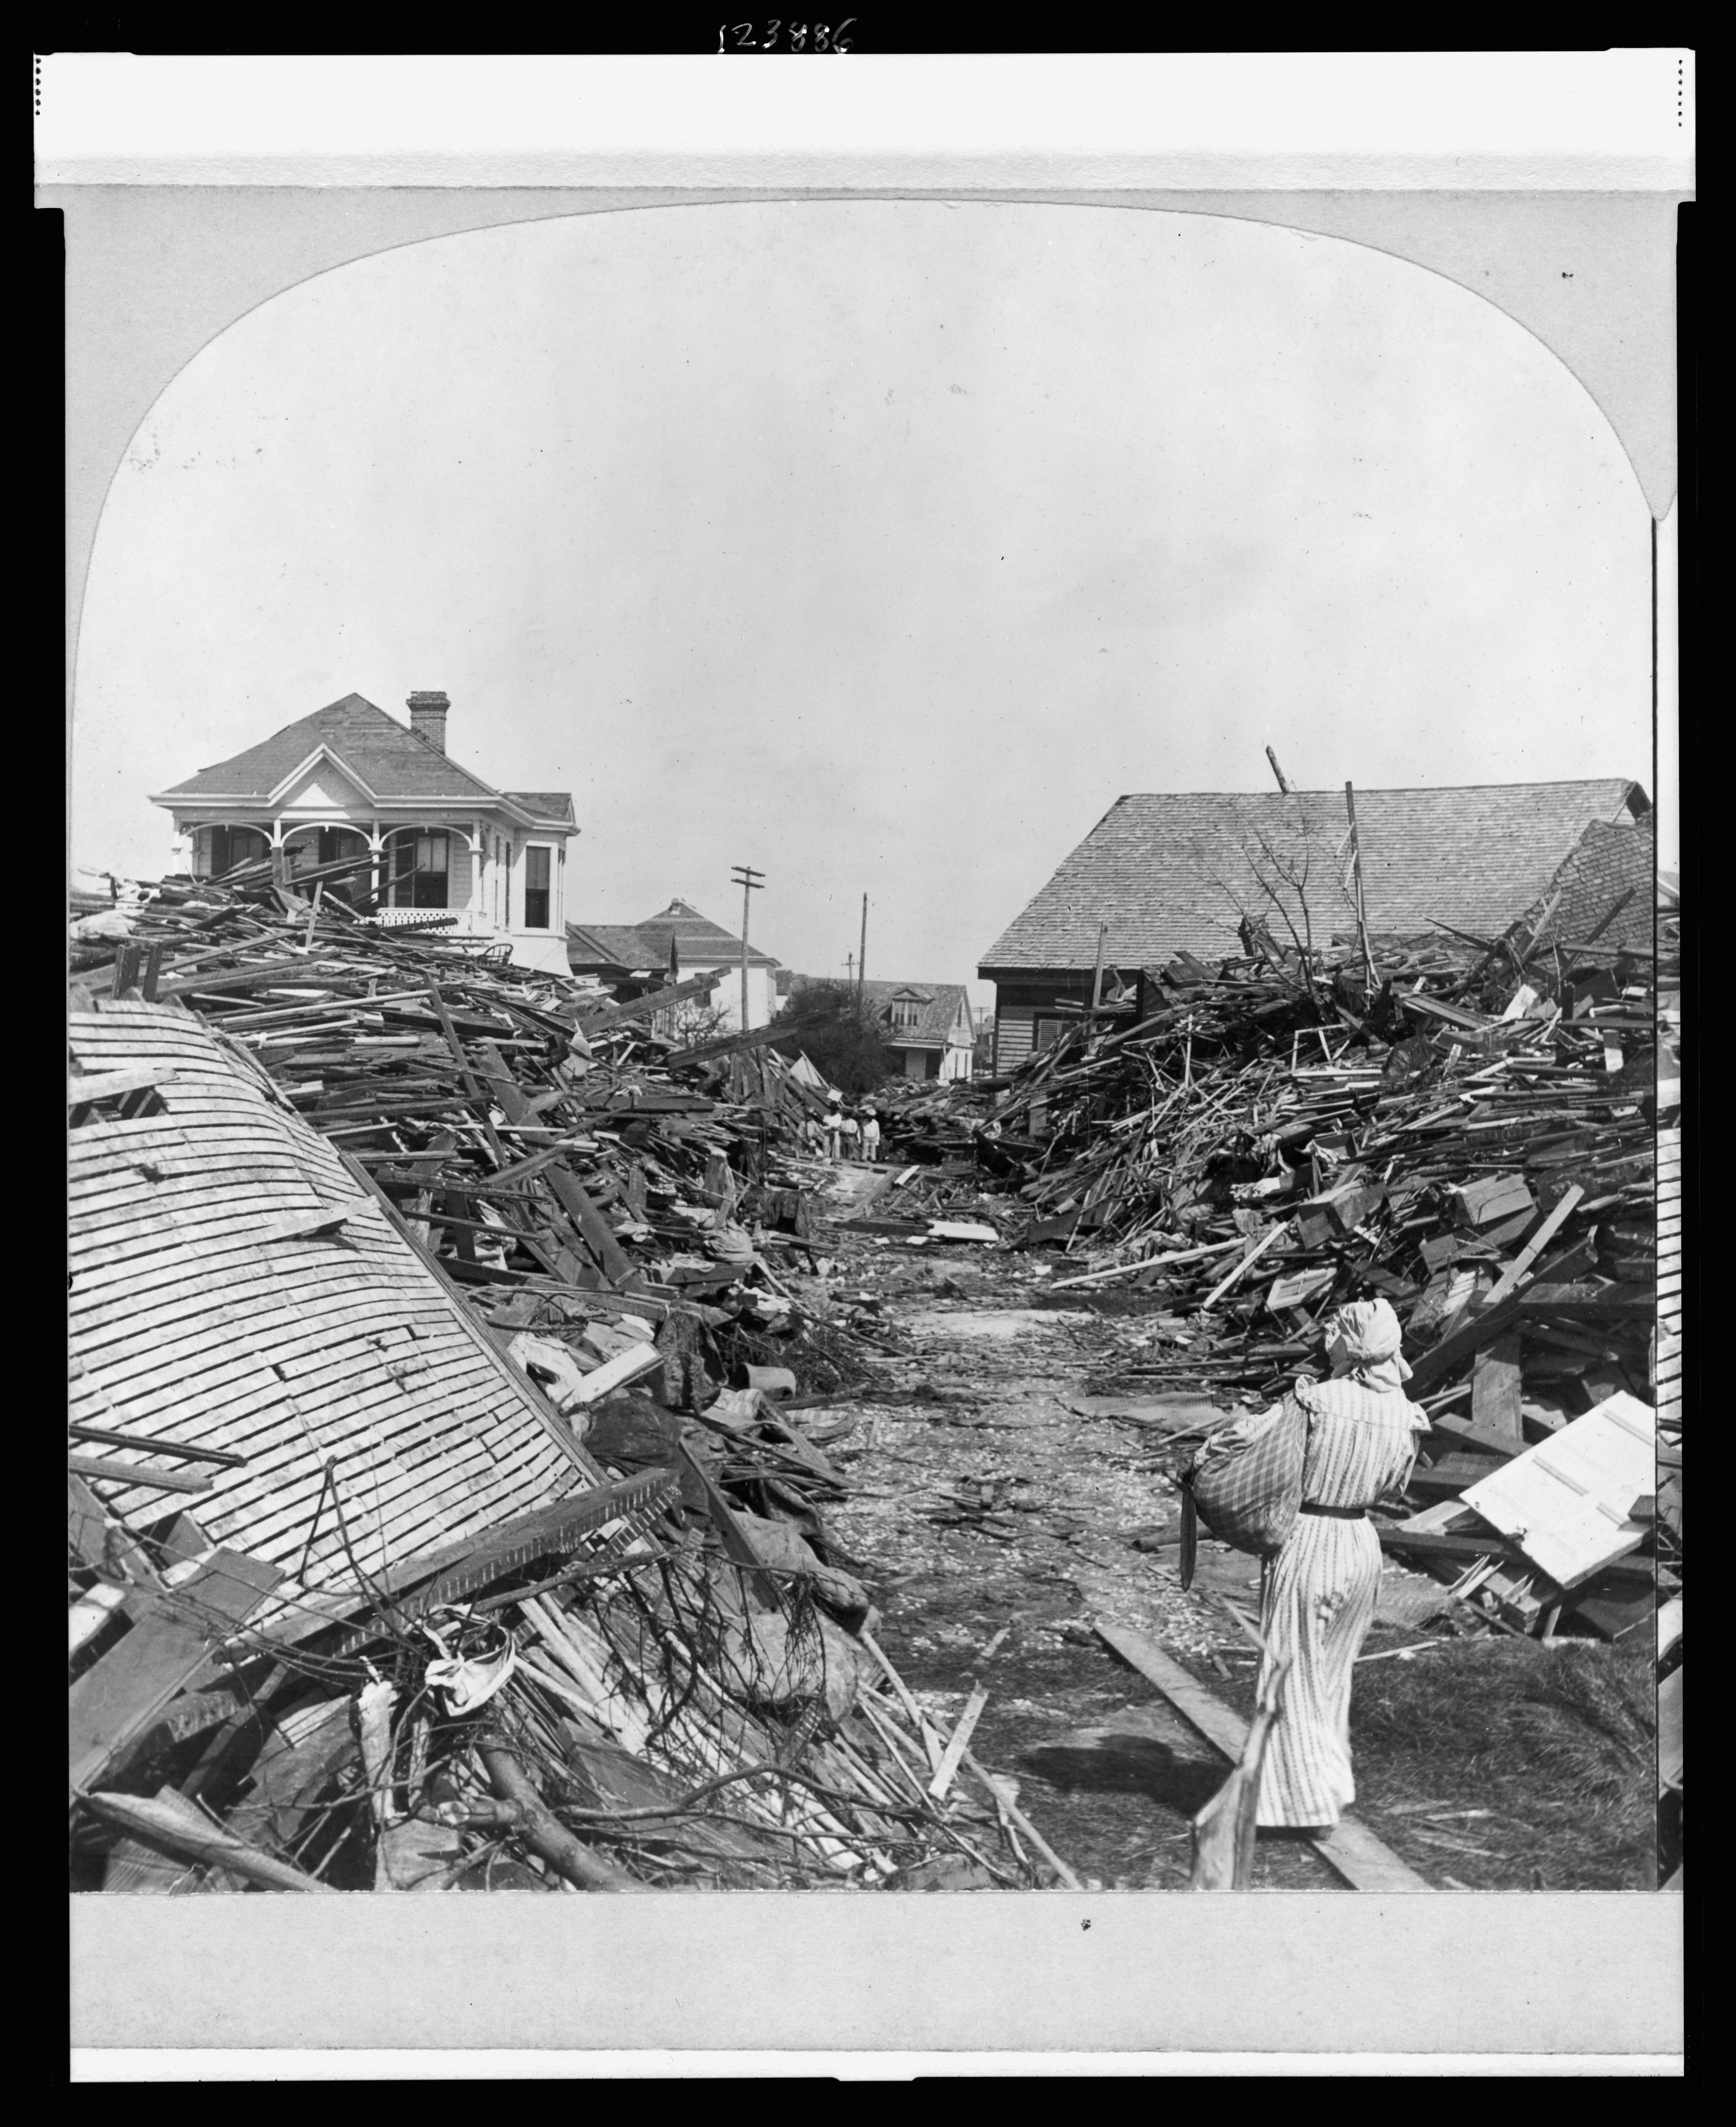 19th Street In Galveston Texas Following The 1900 Hurricane C 1900 4129x5058 Galveston Galveston Hurricane Galveston Texas